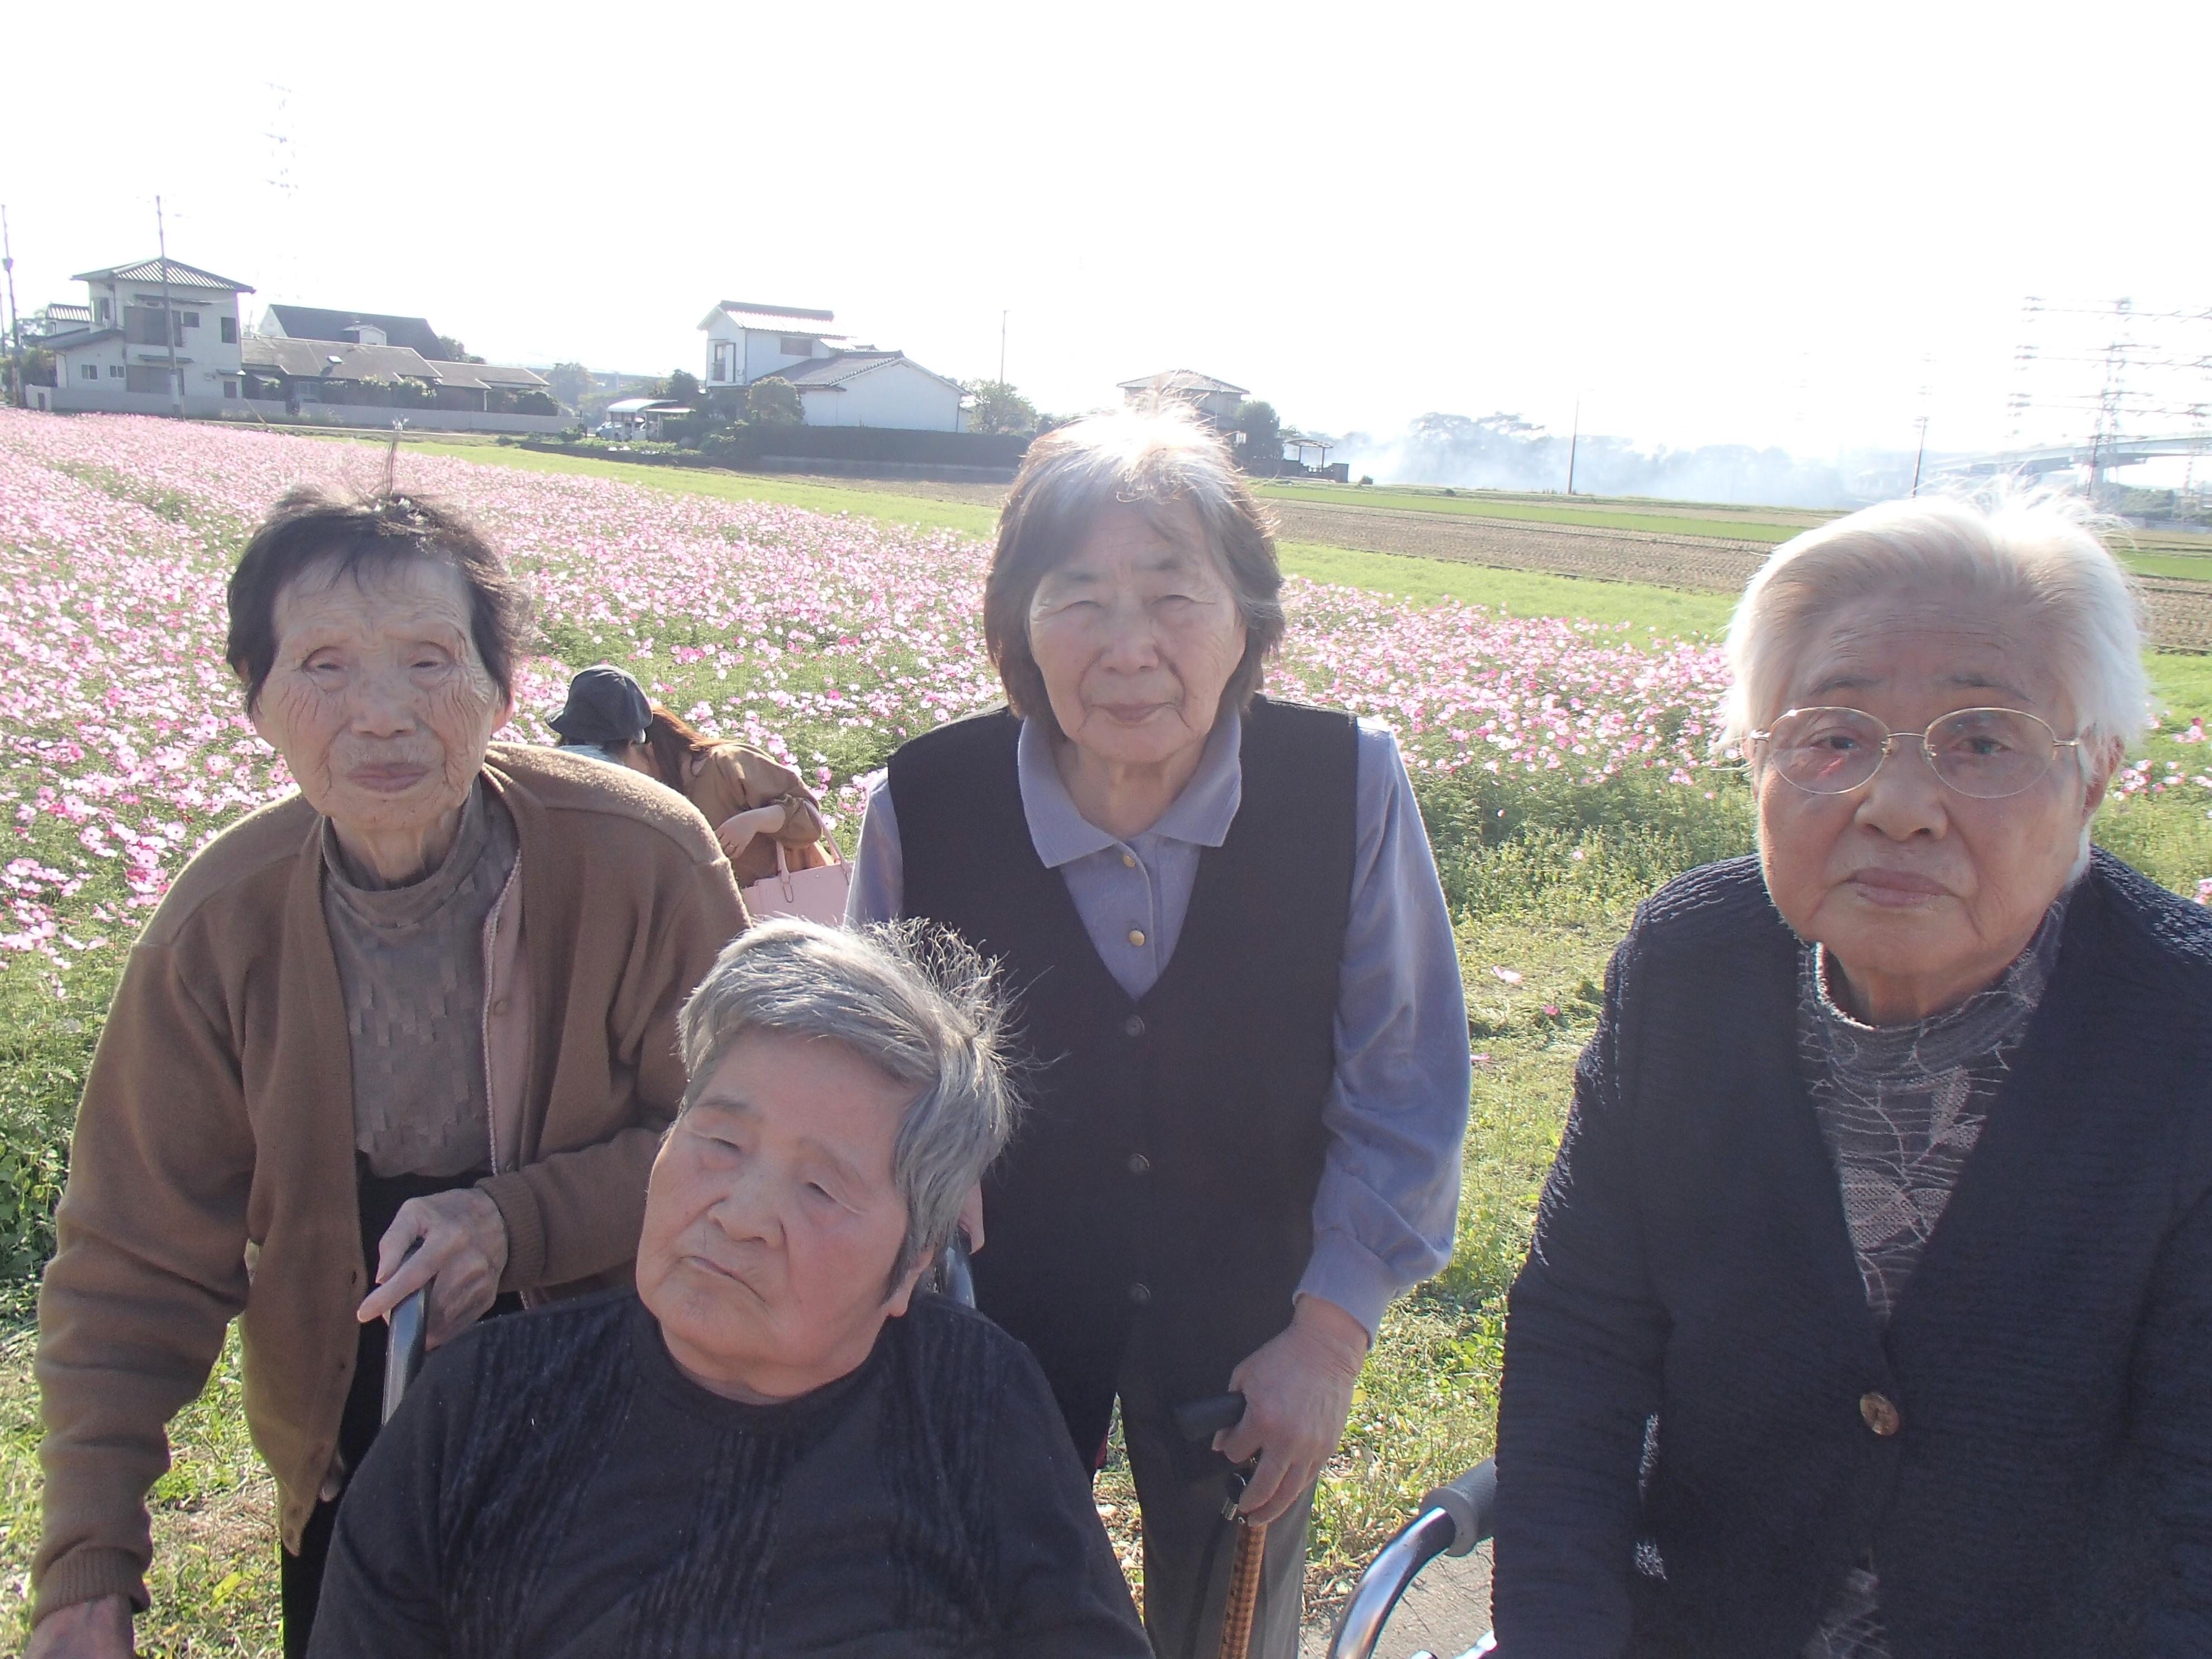 http://kitatikuzen.net/news/PA270660.JPG